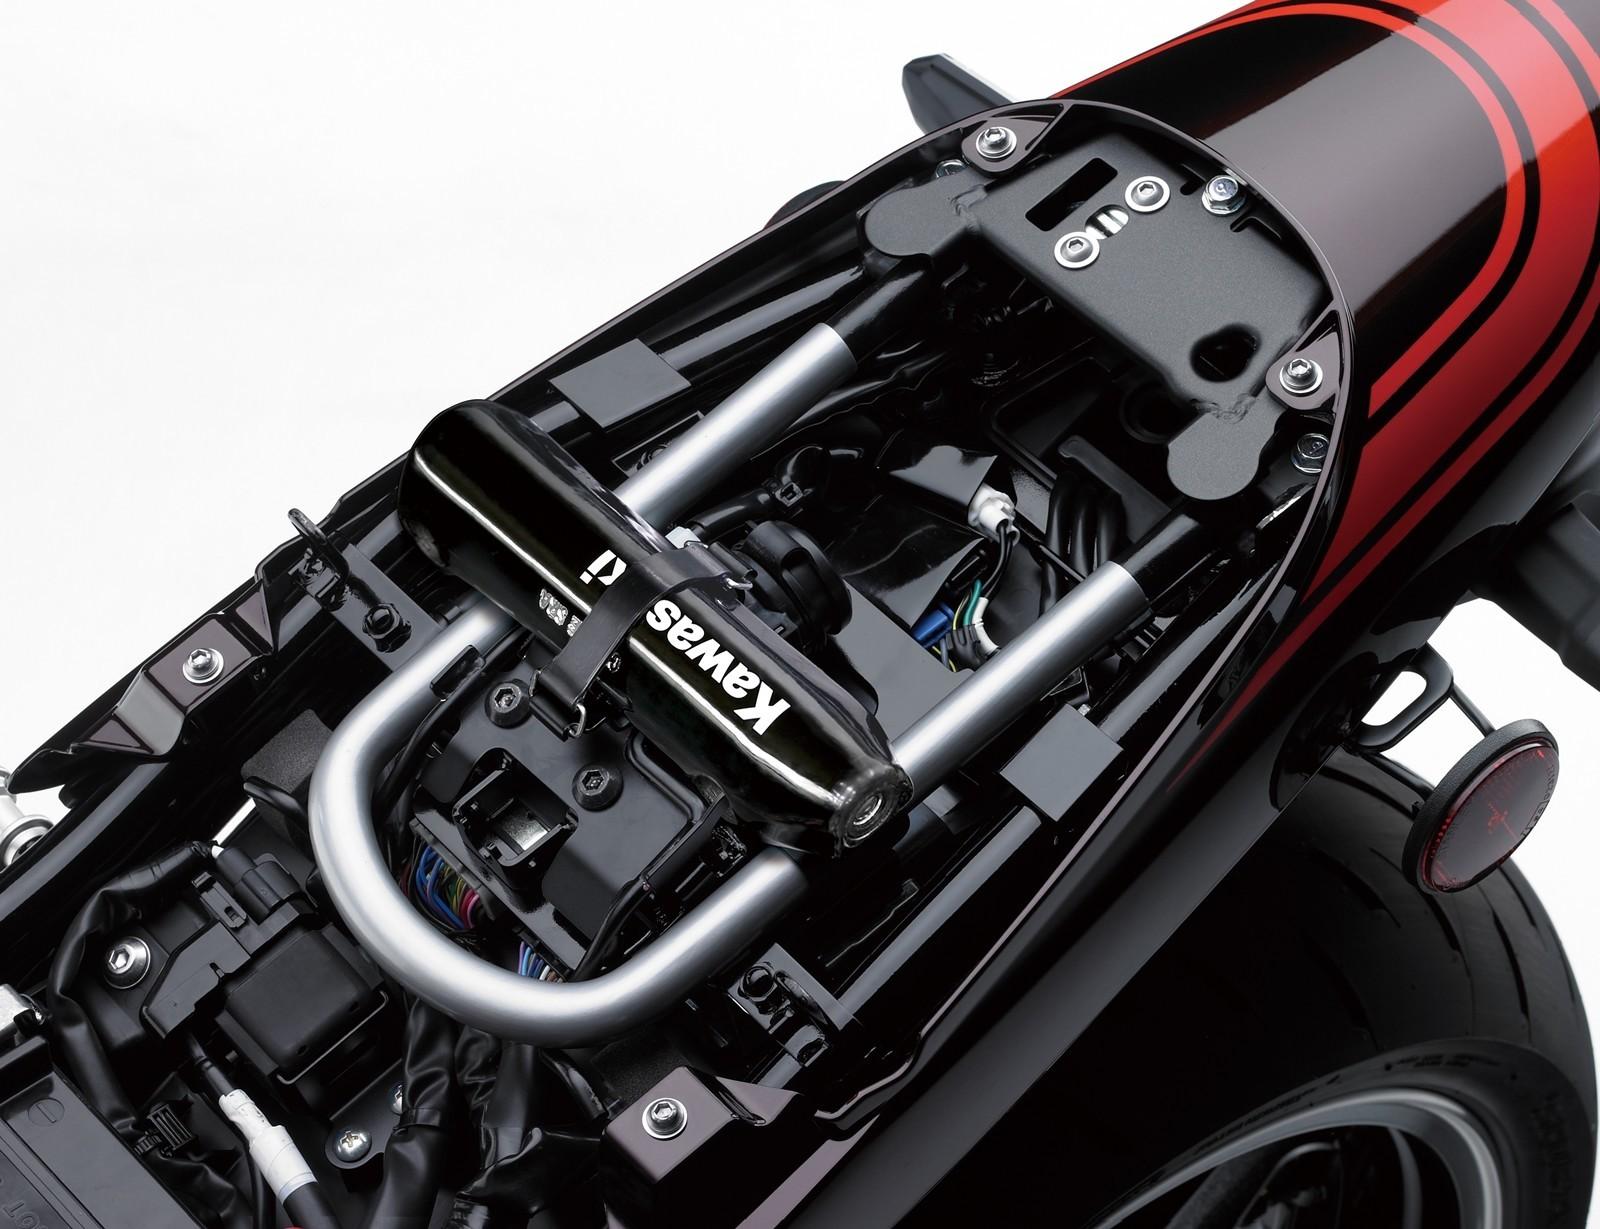 Kawasaki Z900rs Oferta Dm 12